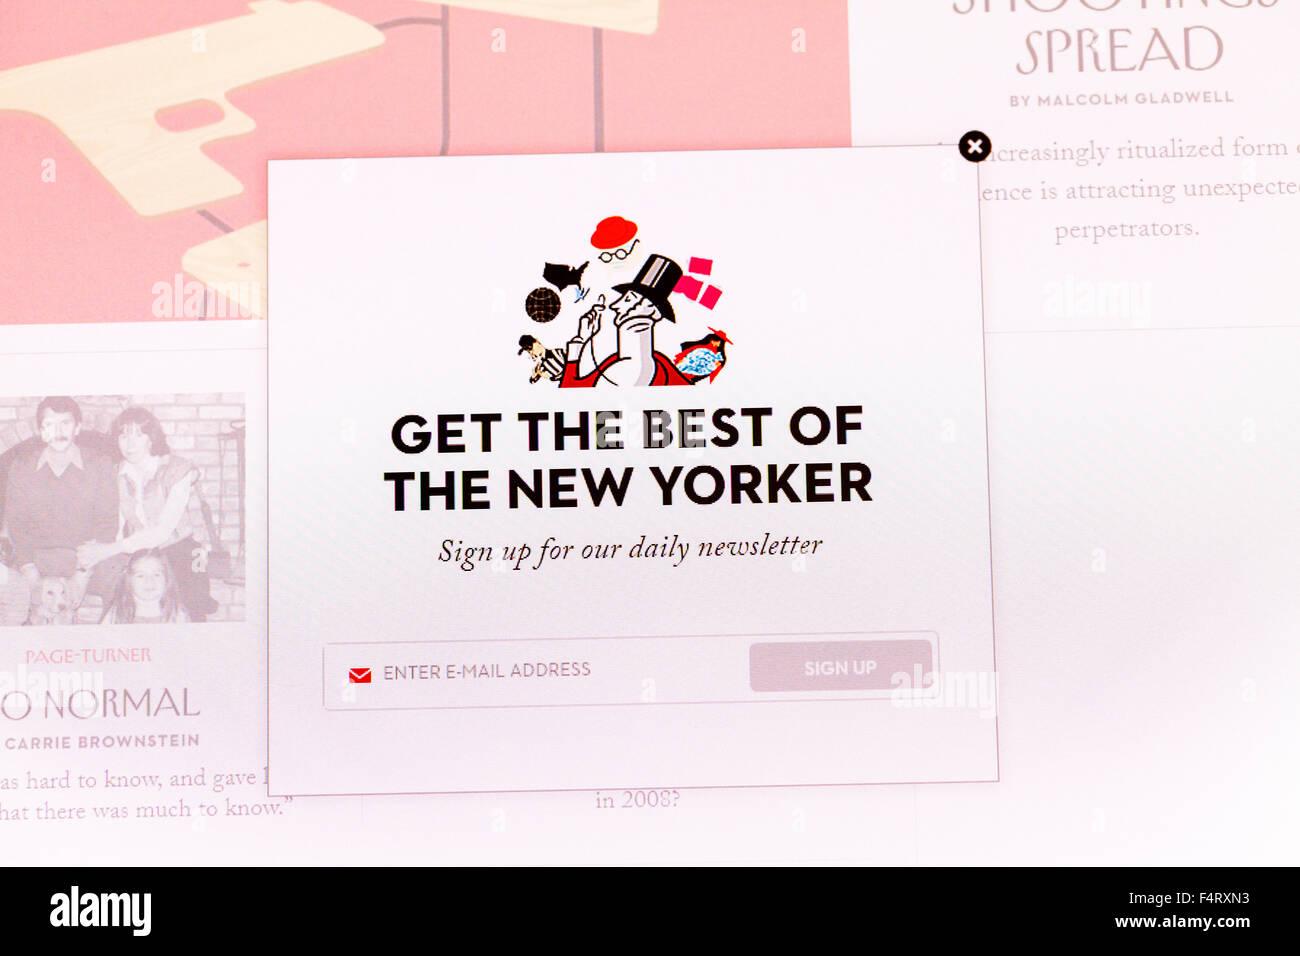 new yorker magazine log in